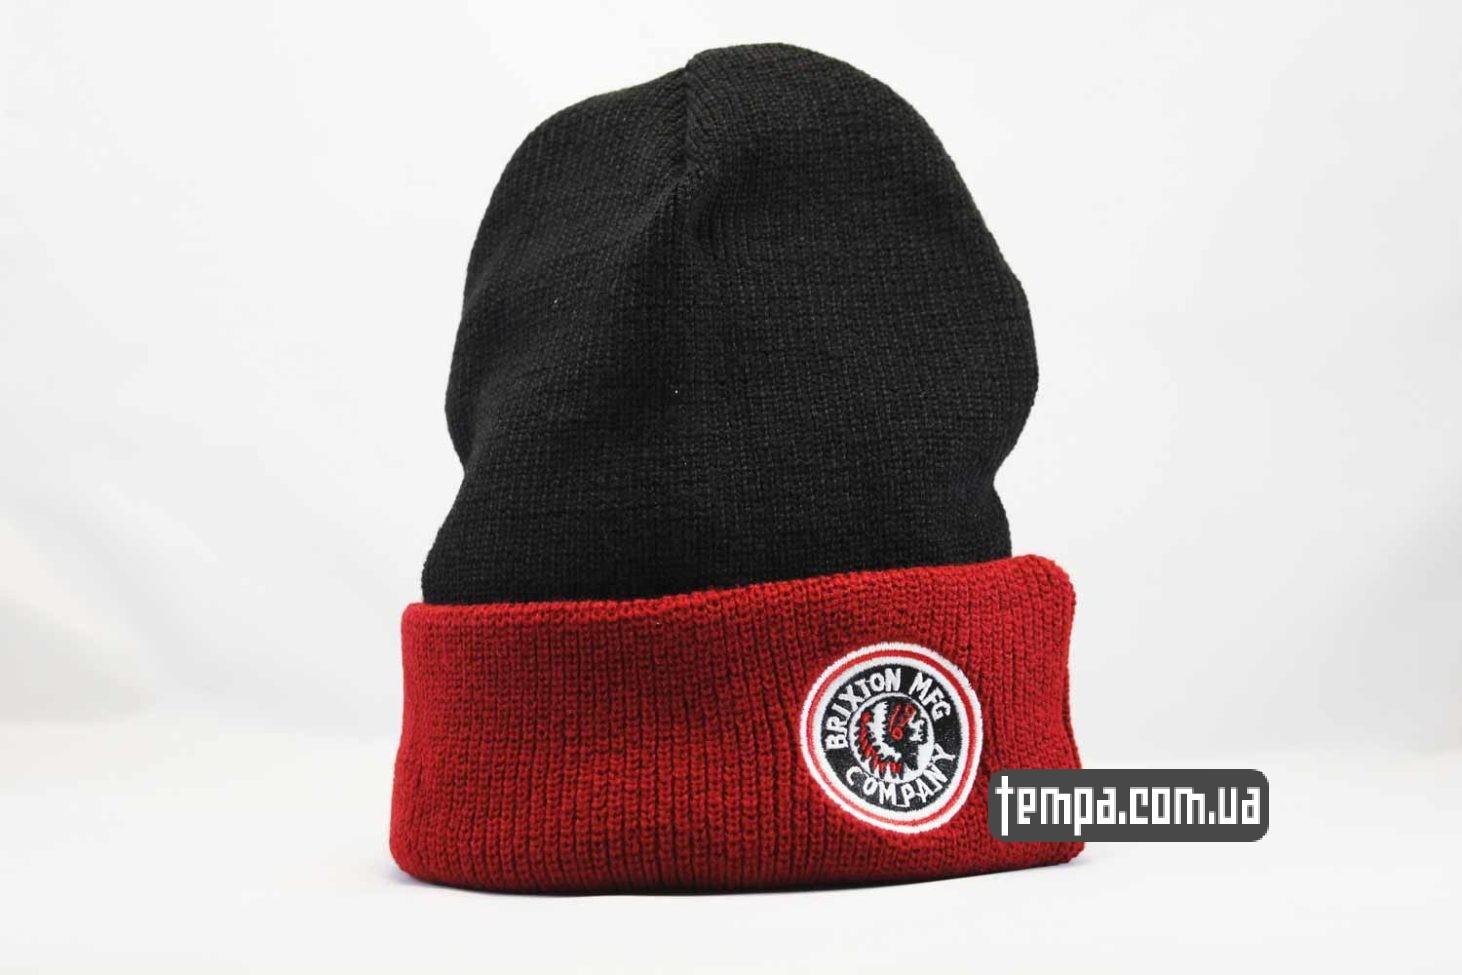 шапка beanie brixxton mfg company indian красная черная с индейцем